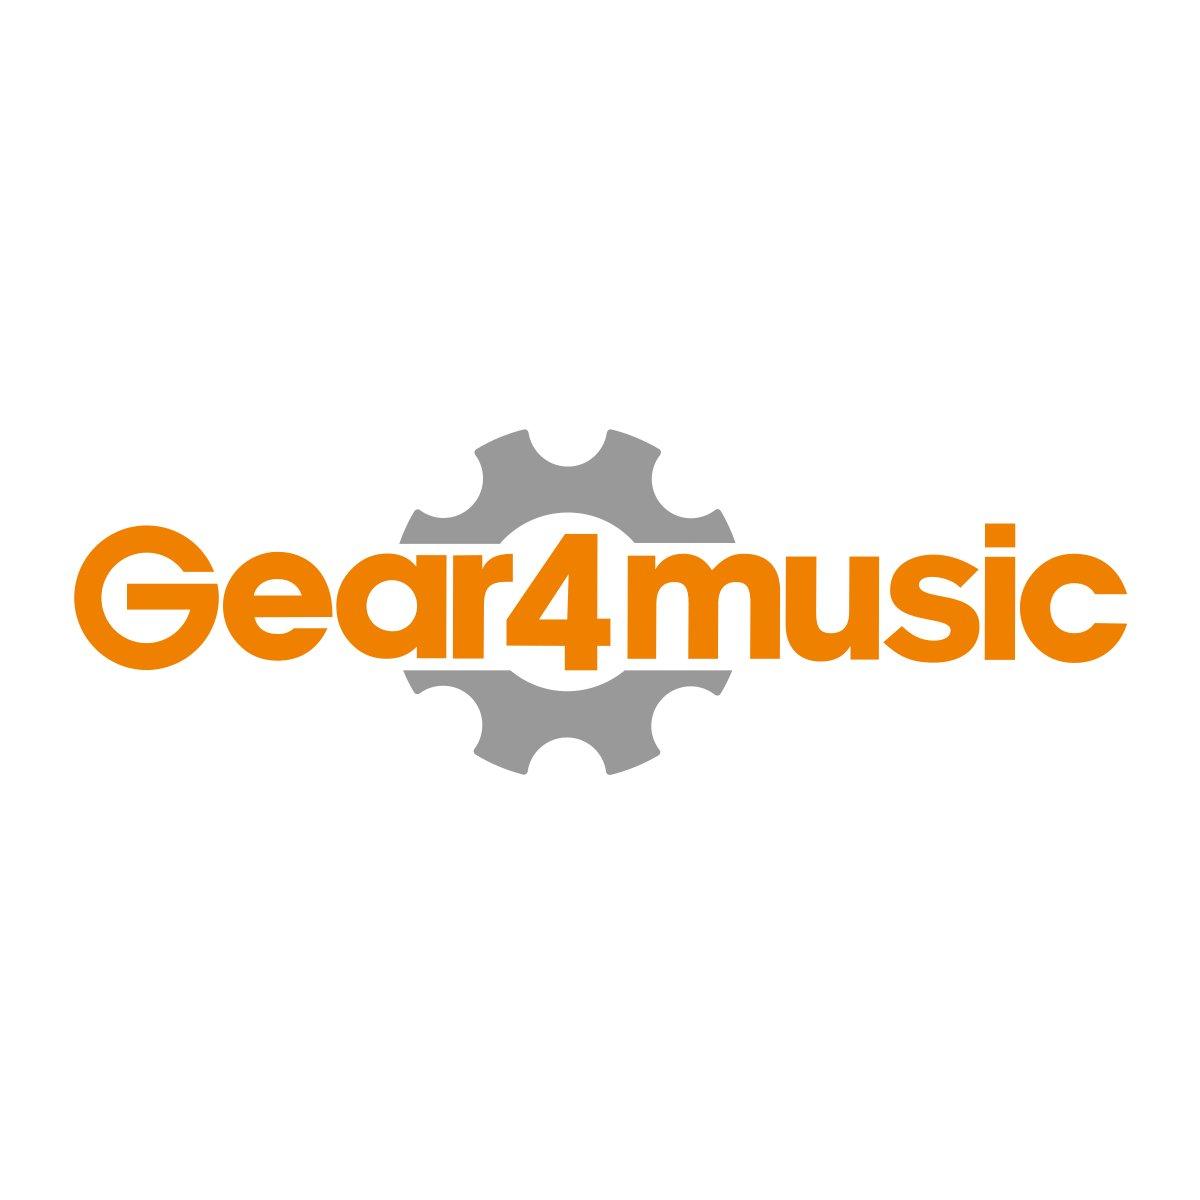 6 String Banjo by Gear4music